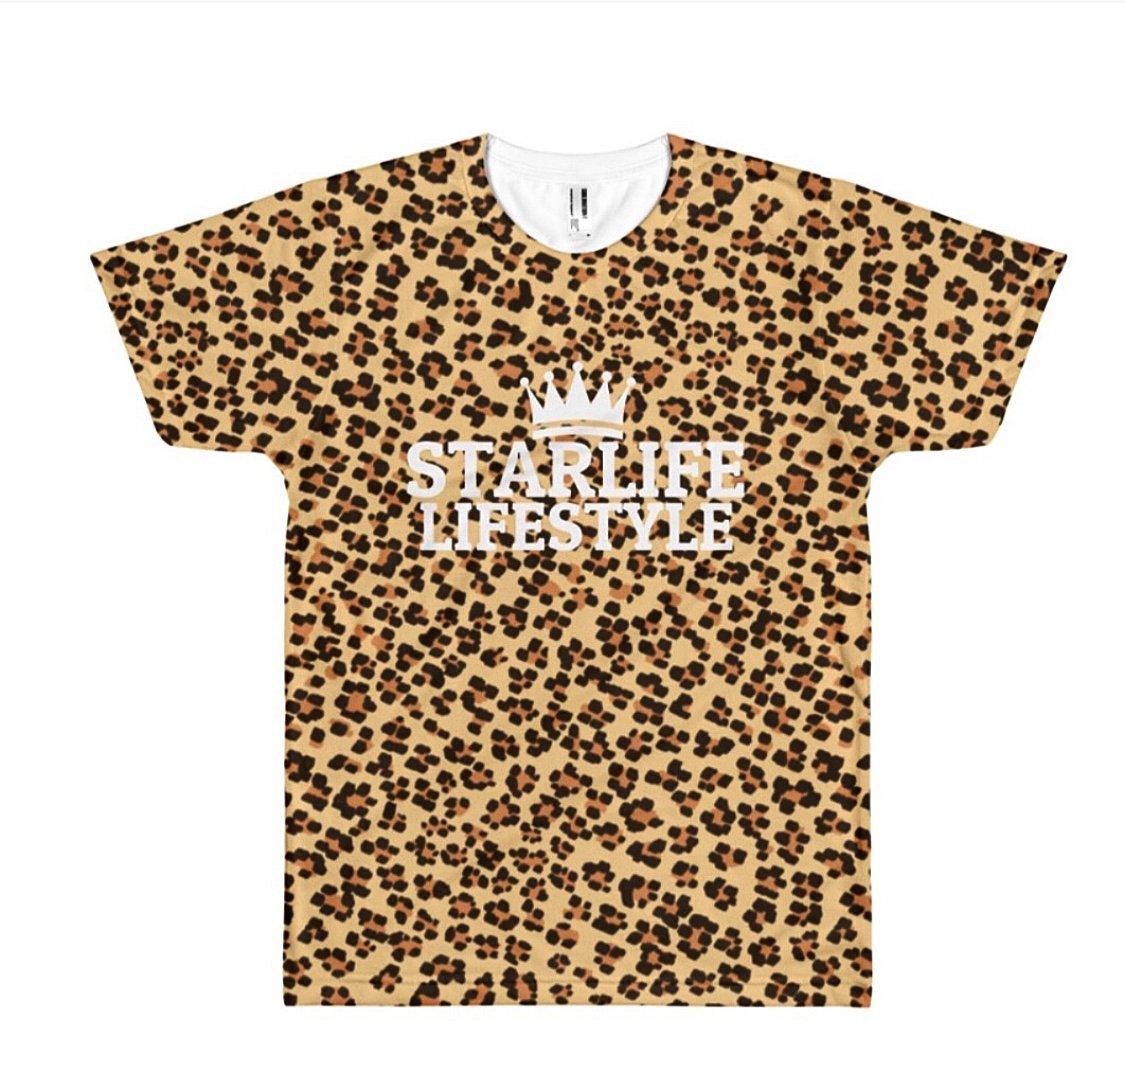 Image of Cheetah Print T-Shirt